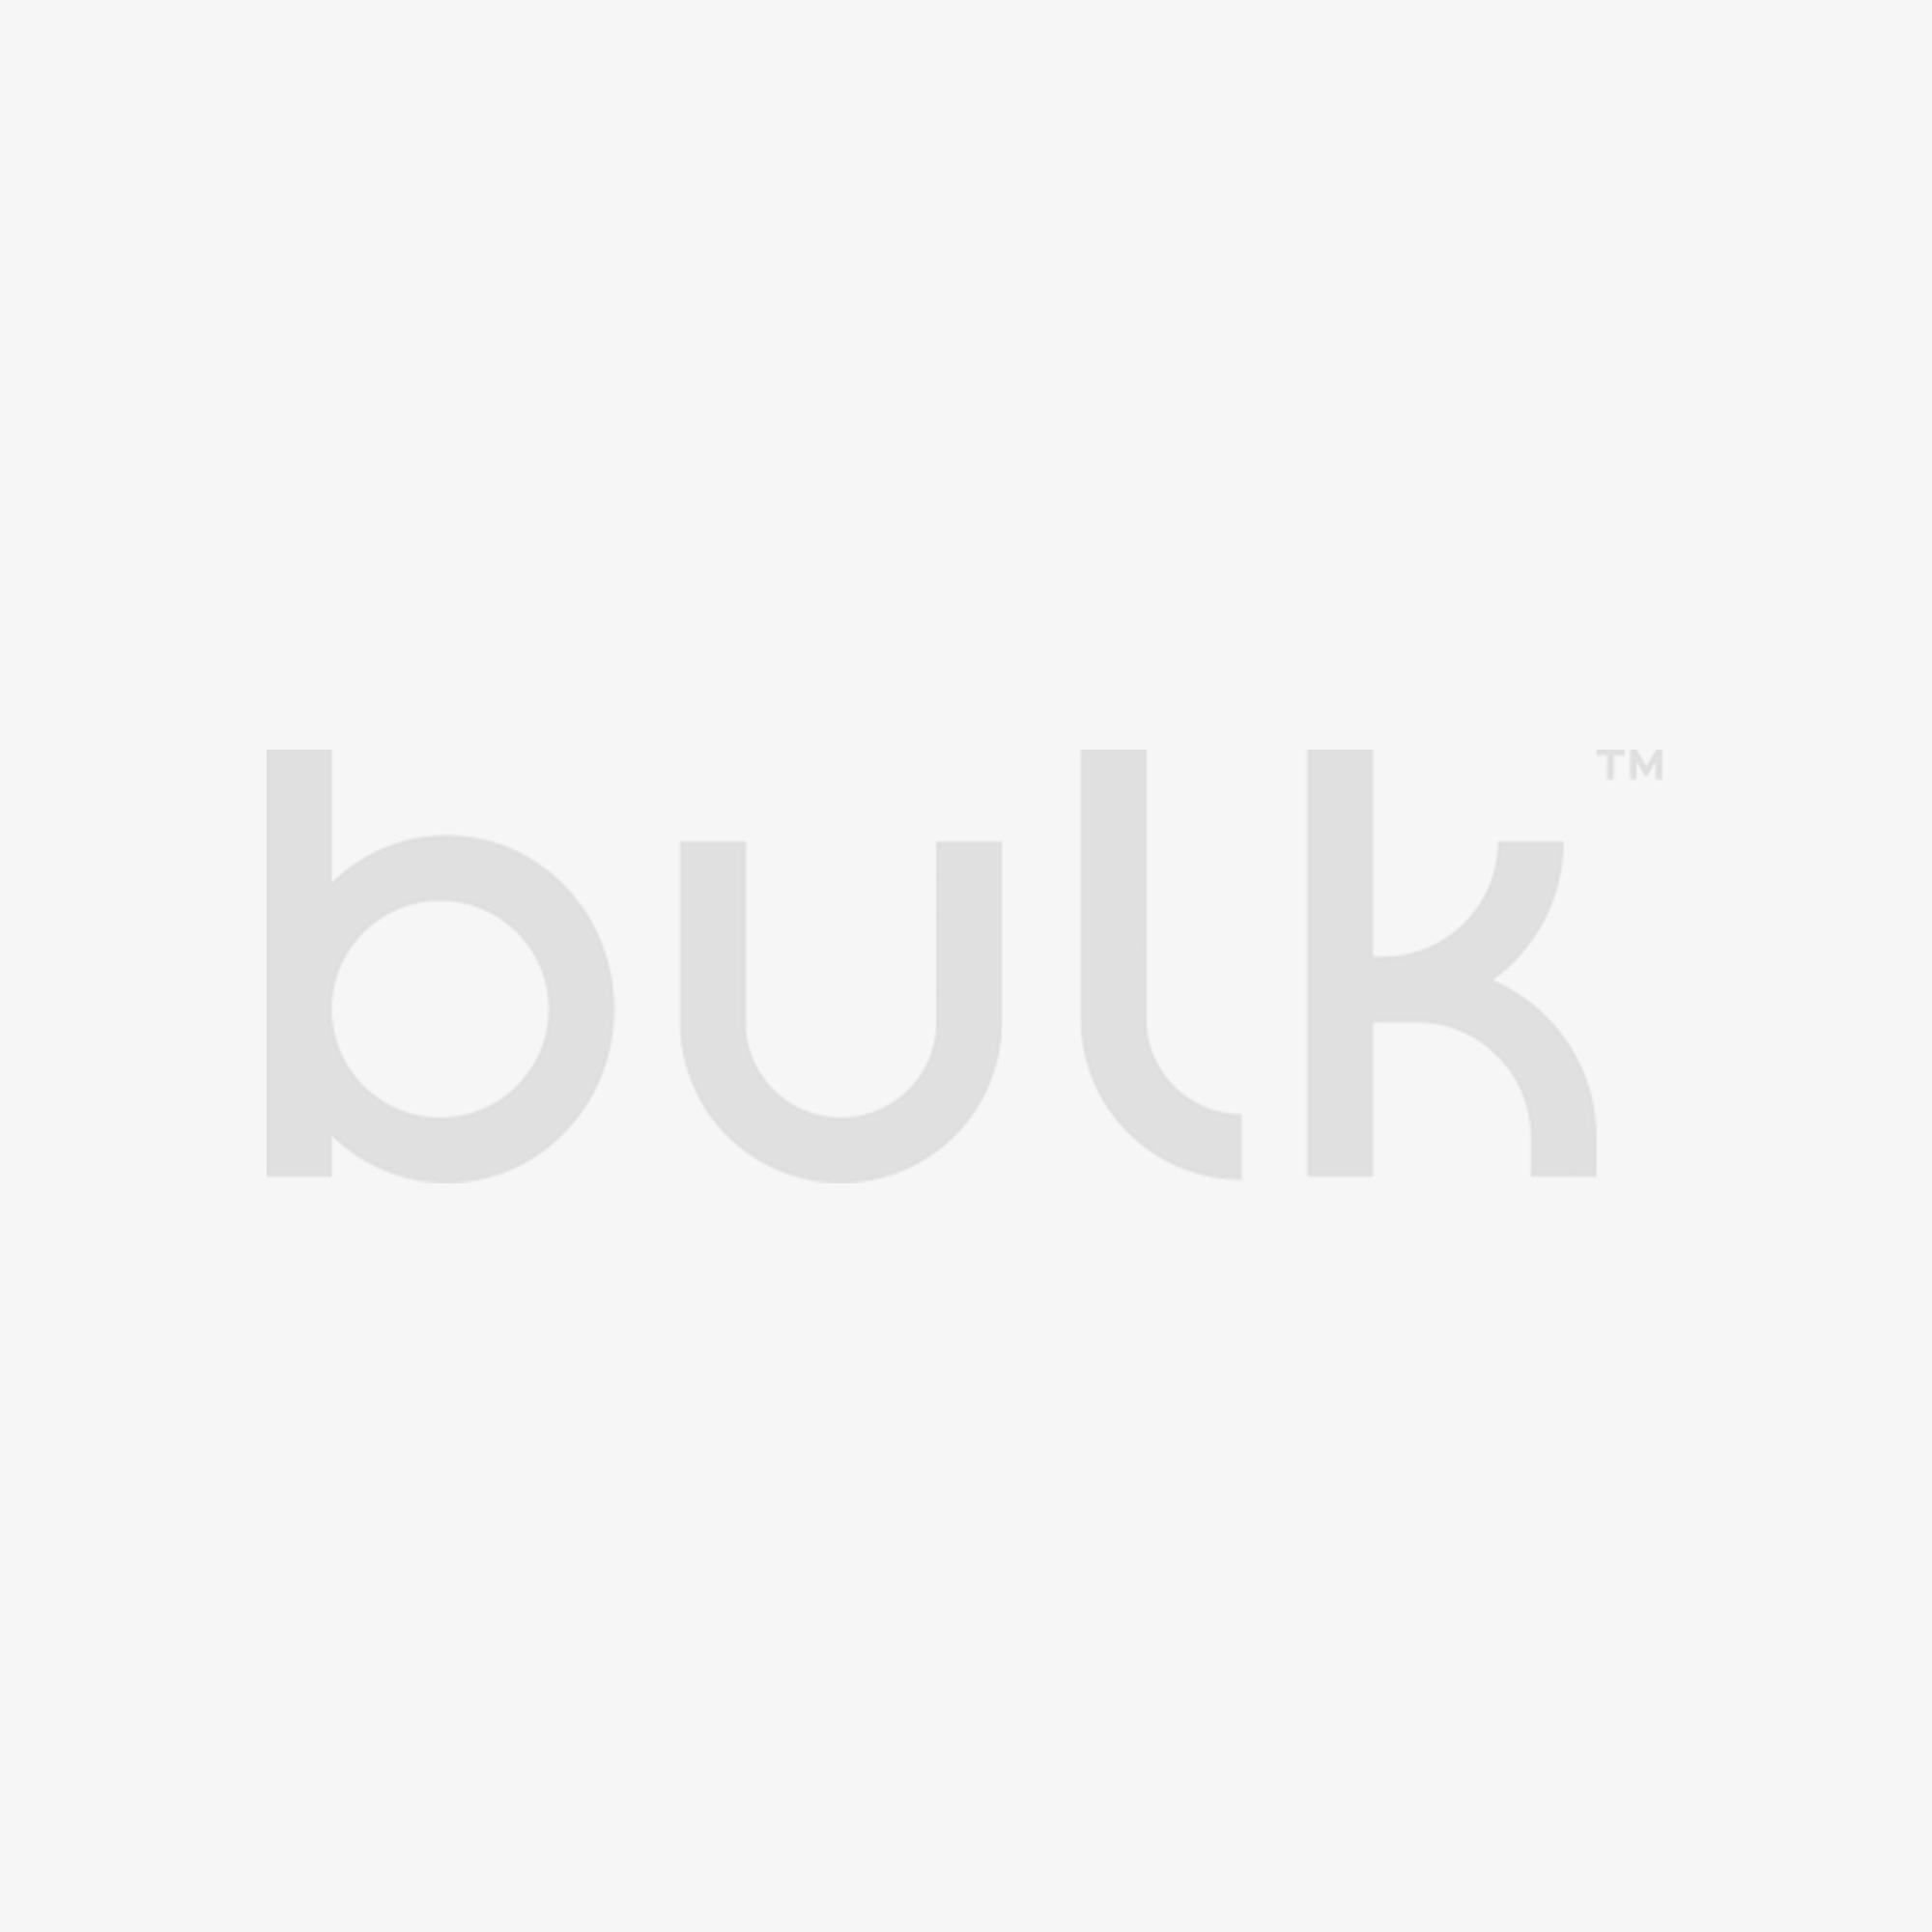 BULK POWDERS™ Koszulka Damska High Performance Czarny Extra Small (XS) (8)